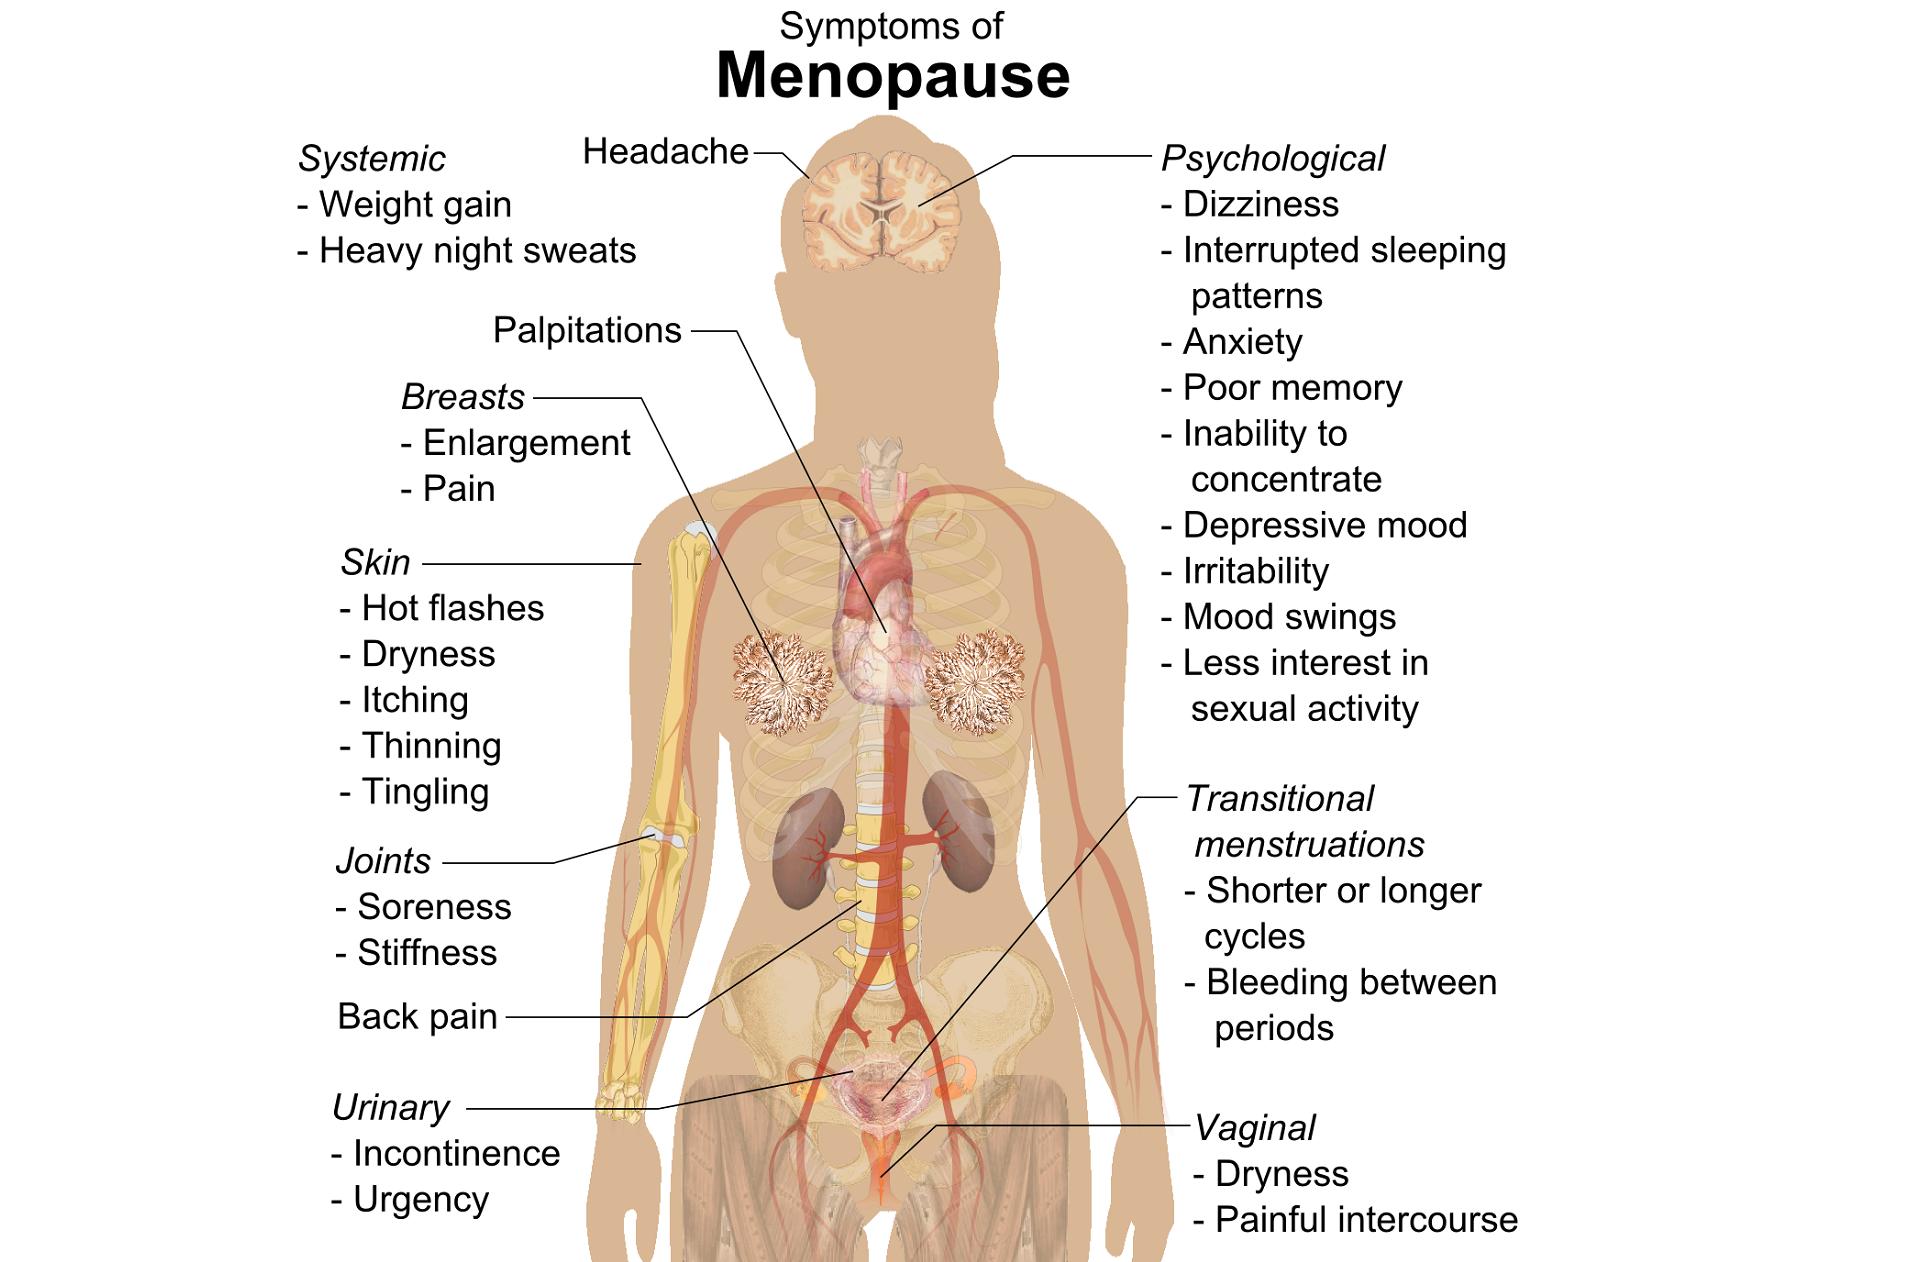 Pelvic, Sexual, and Bone Health at Menopause